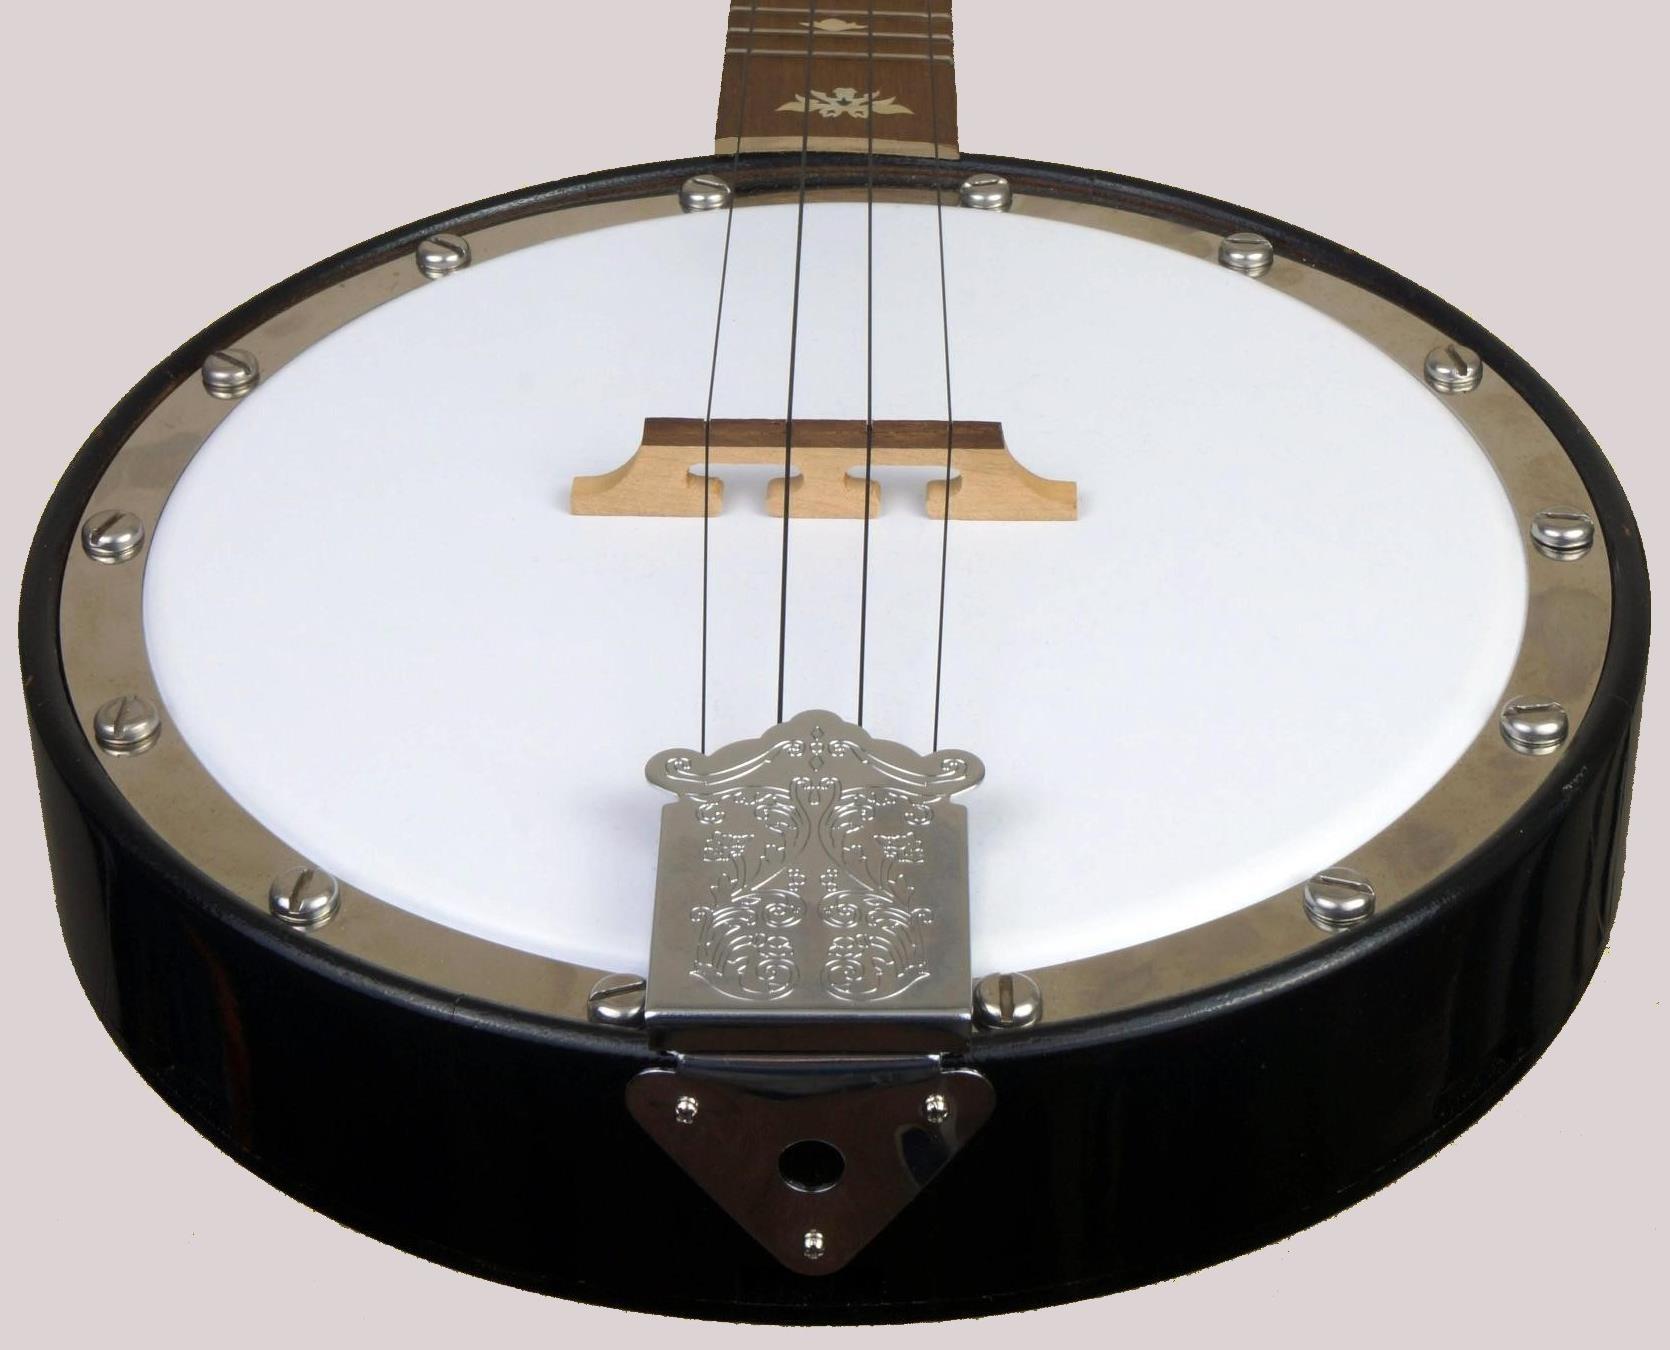 robert headford england Banjolele